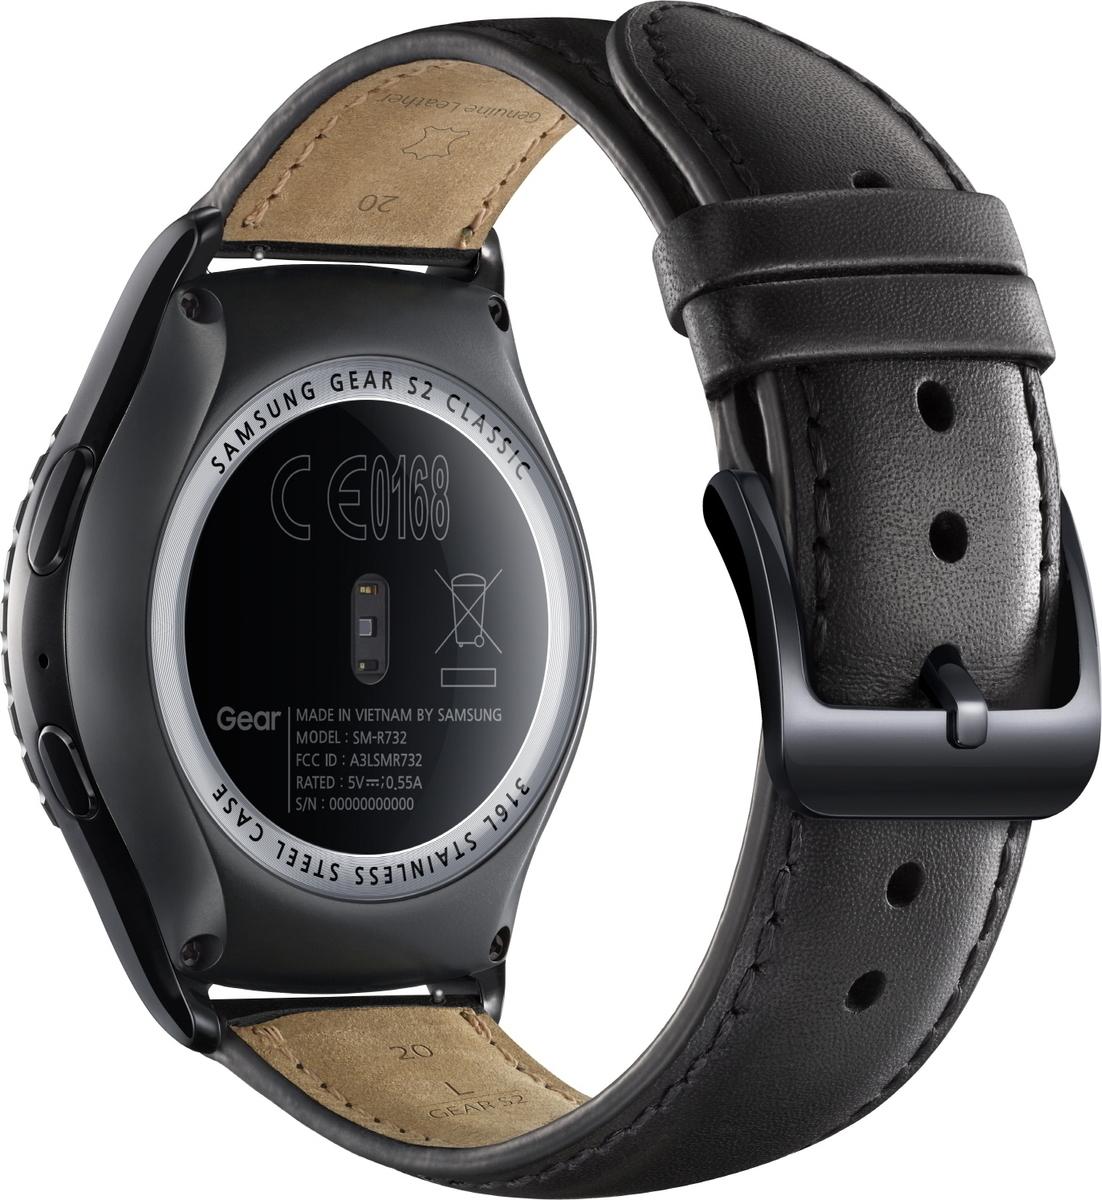 Samsung Gear S2 Classic R7320 Black EU